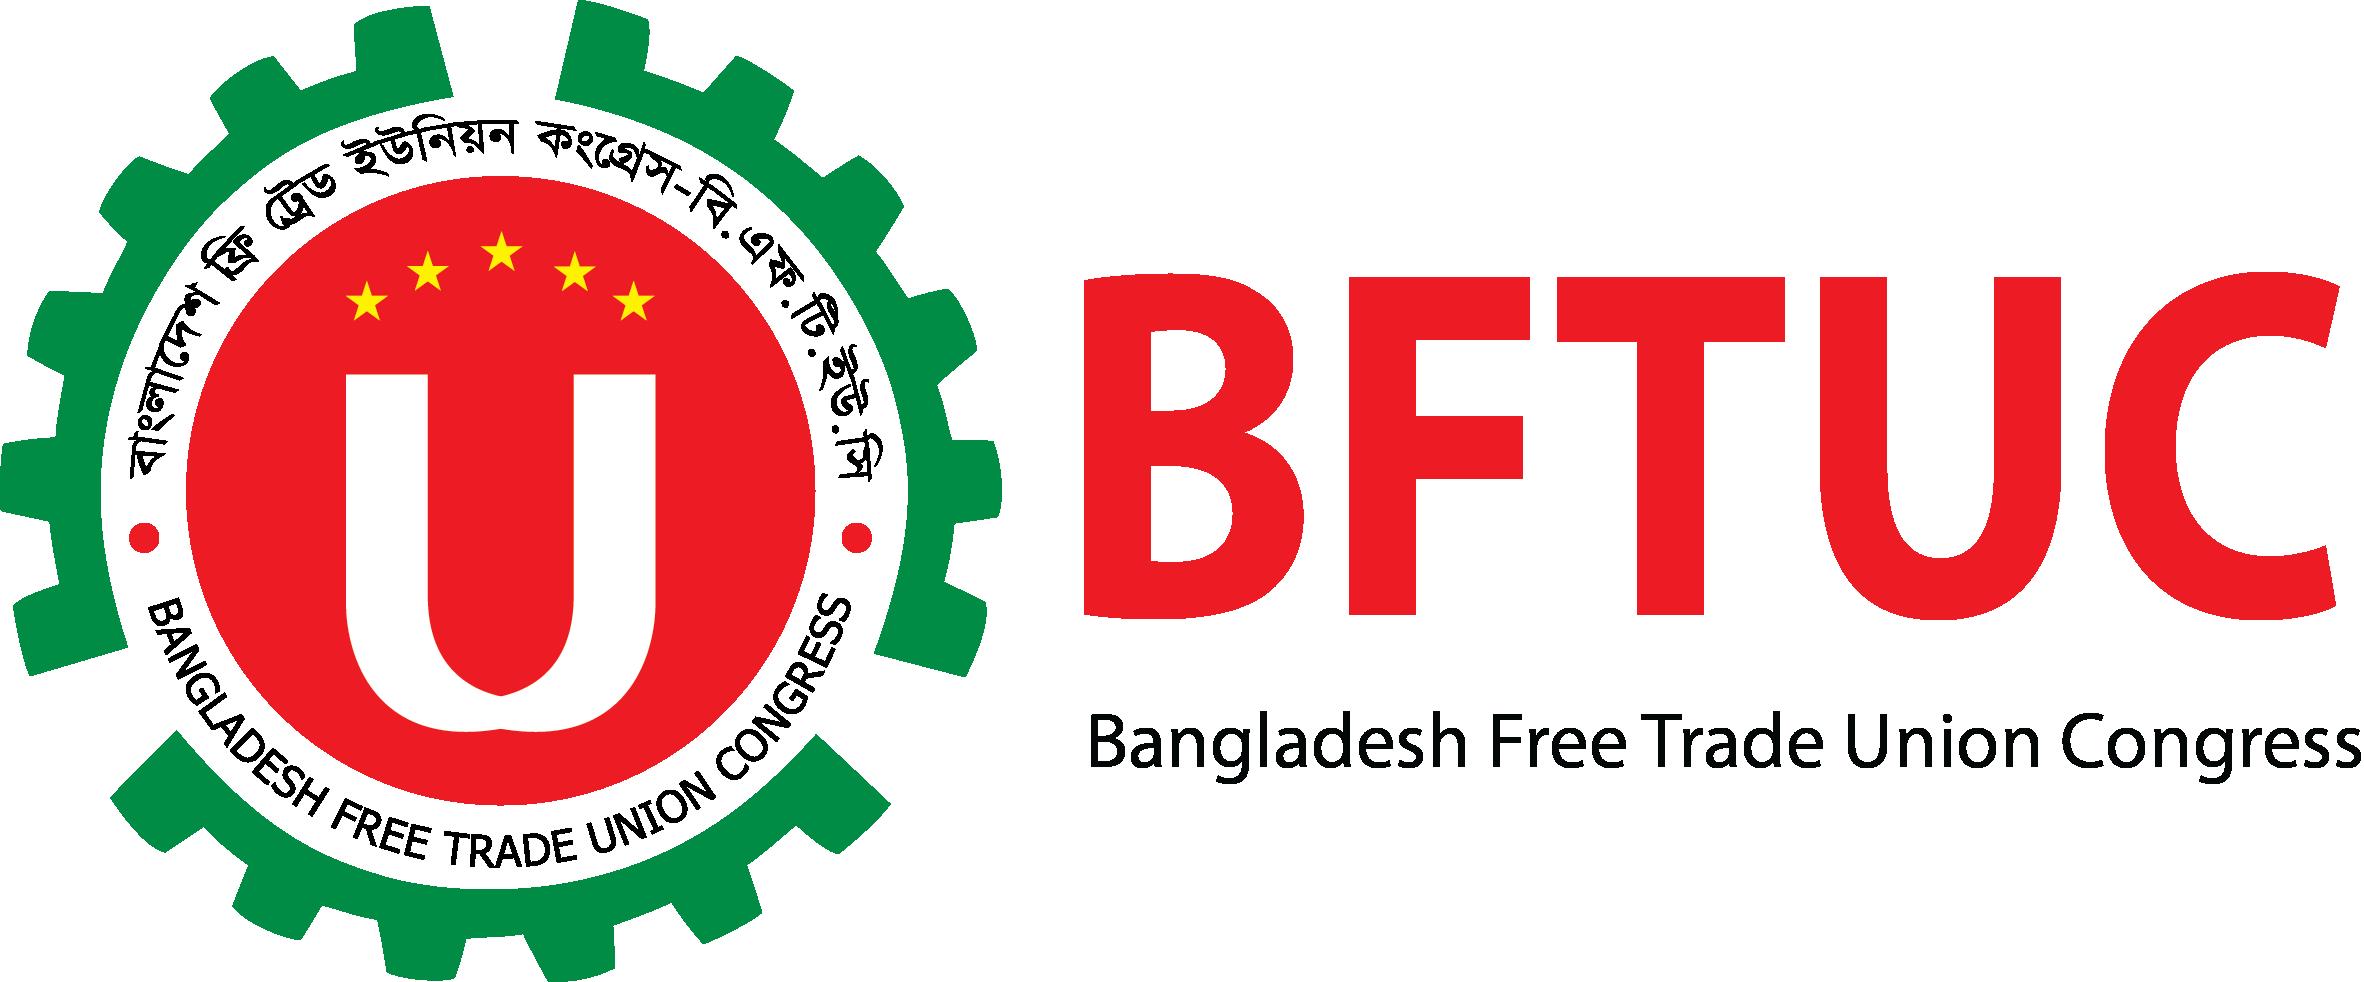 Bangladesh Free Trade Unions Congress